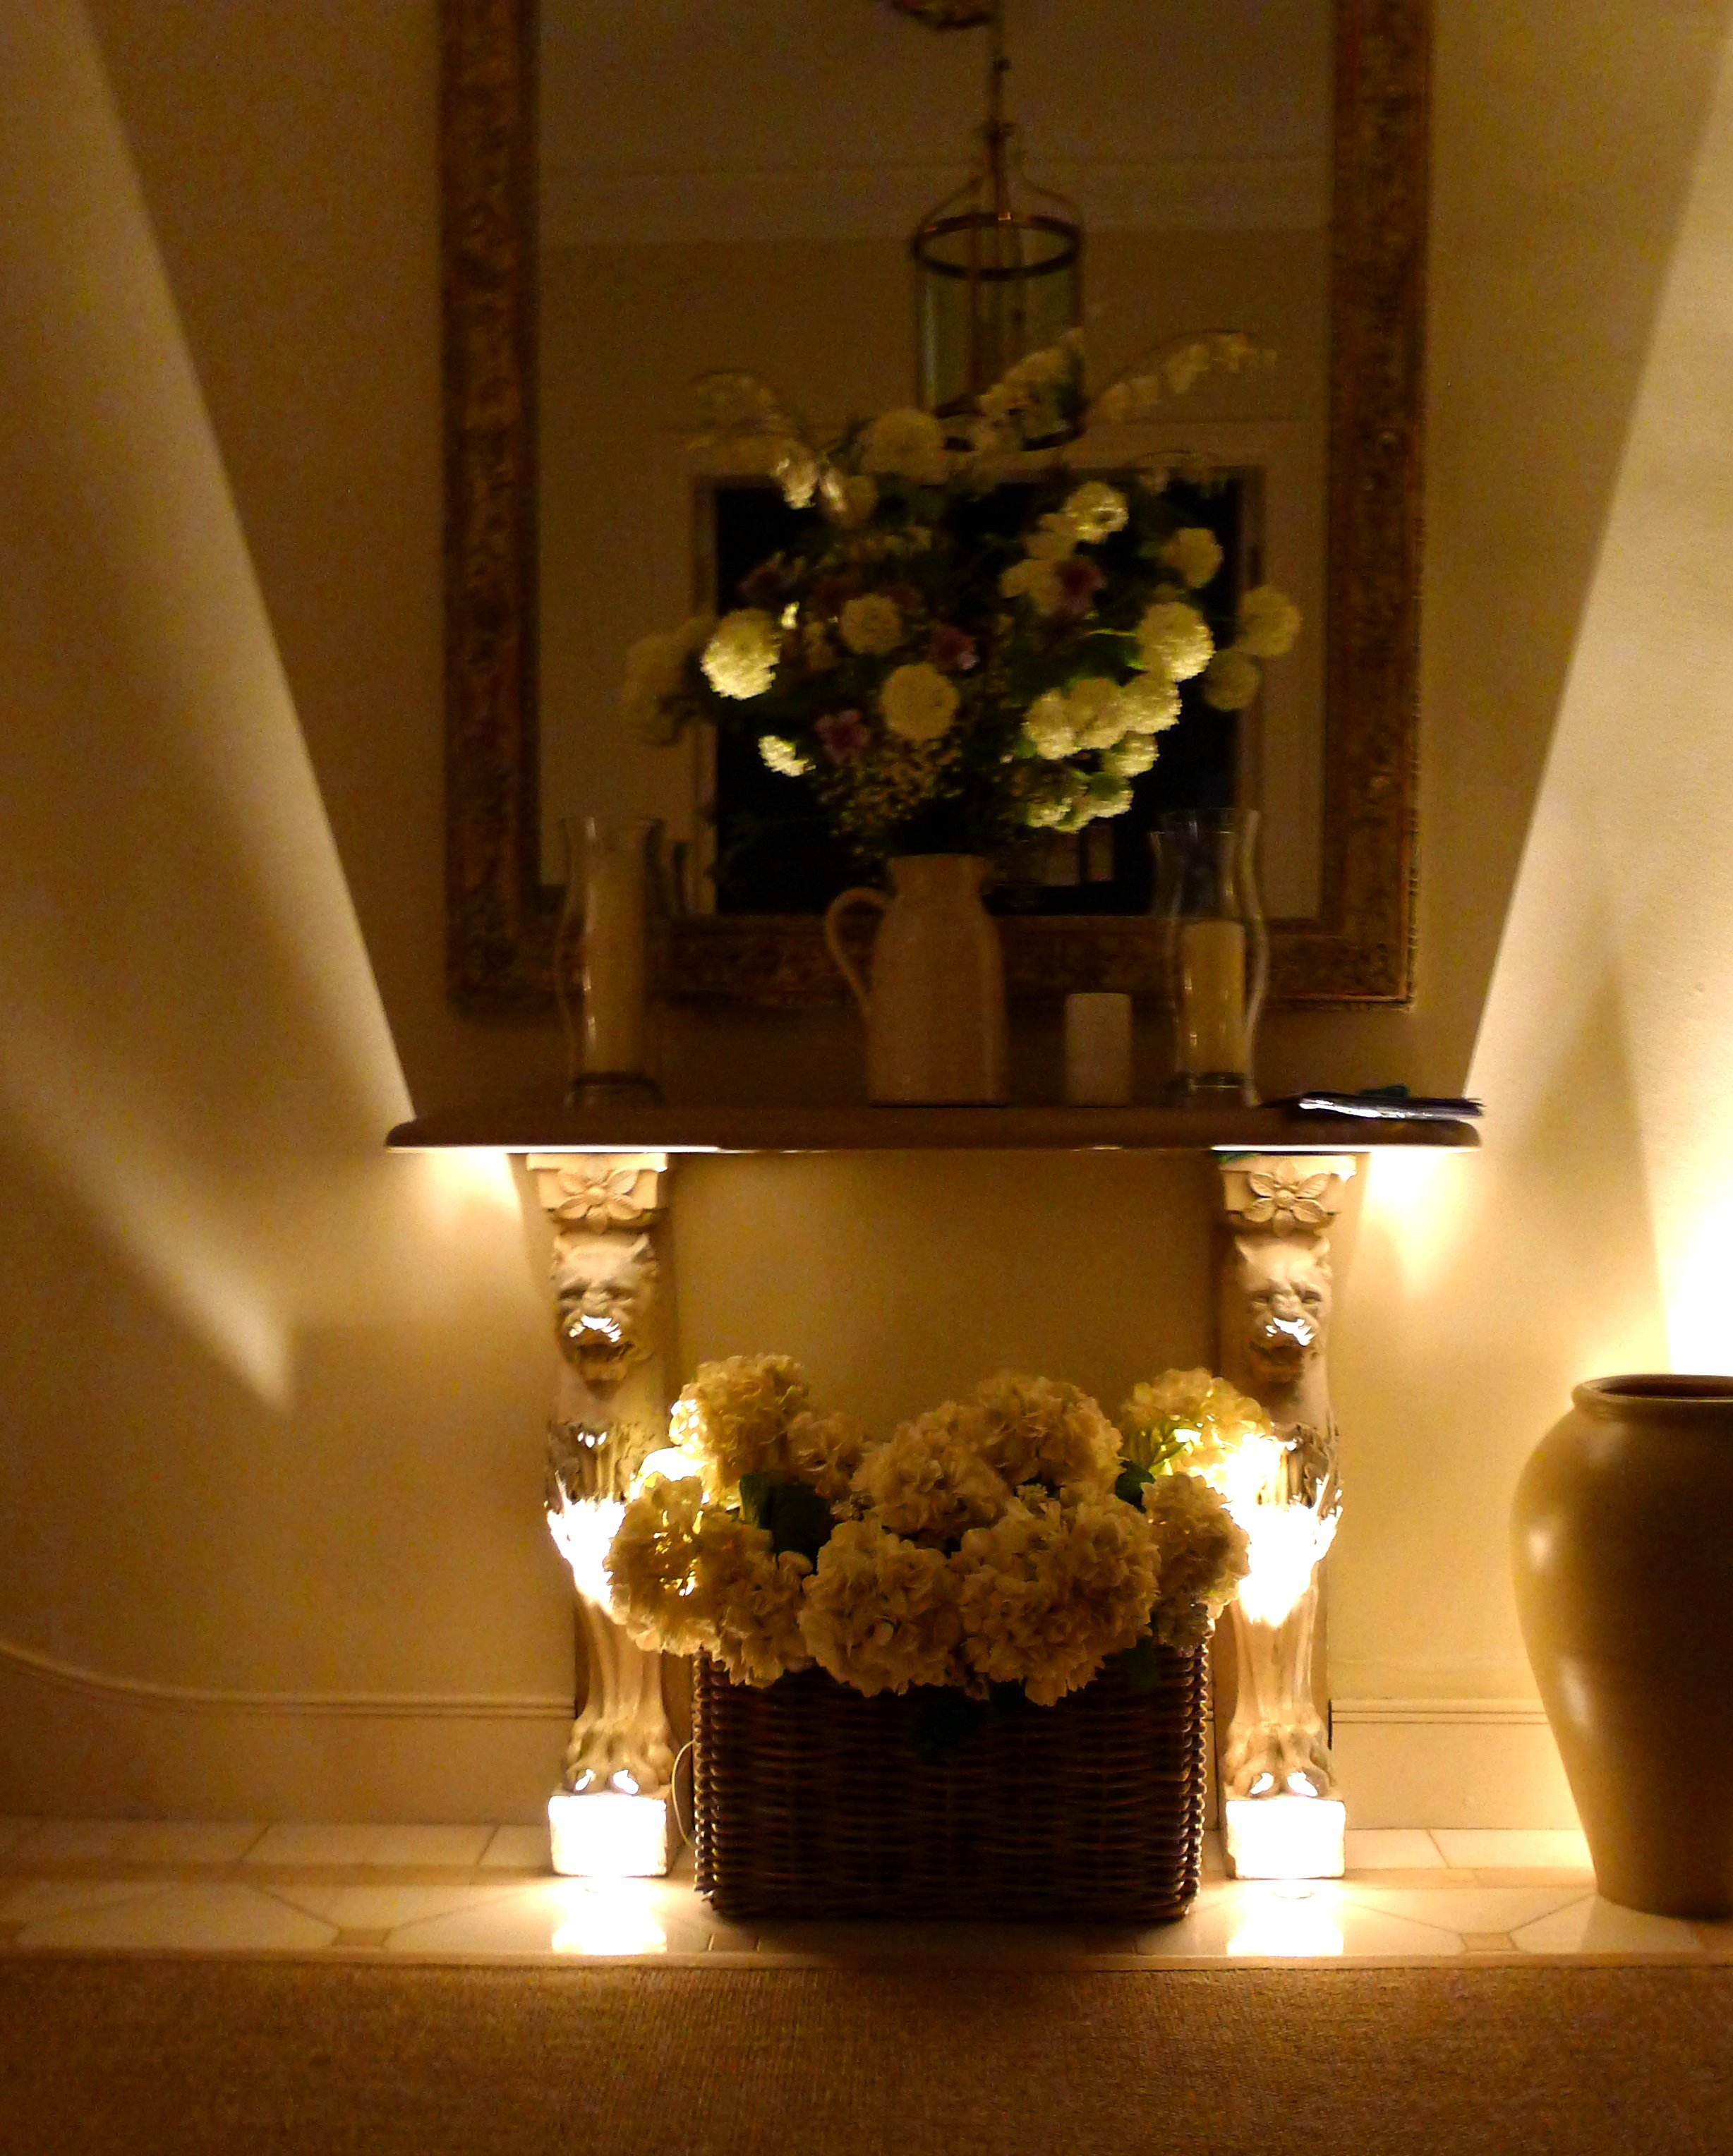 Lighting Basement Washroom Stairs: Beautiful Lighting Effects With LED Uplights!